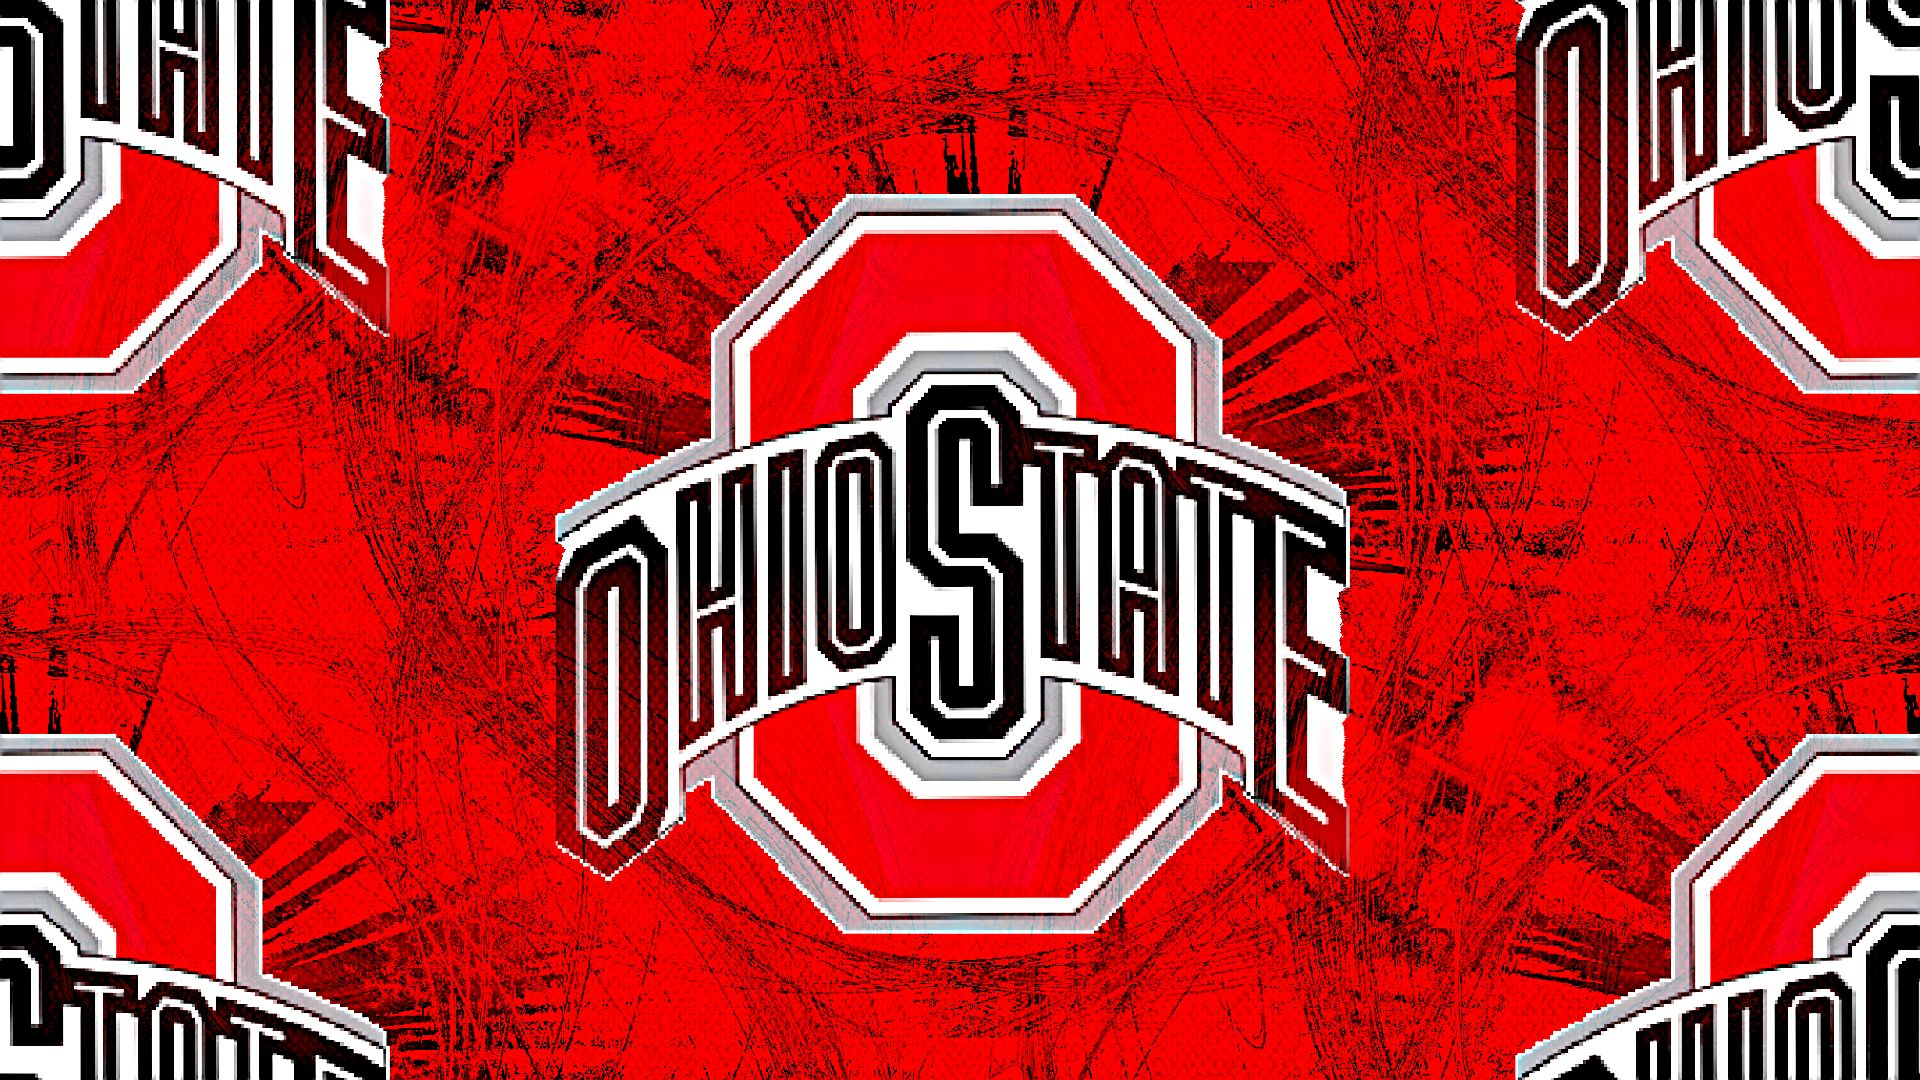 Go bucks | Ohio state football, Ohio state wallpaper, Ohio ...